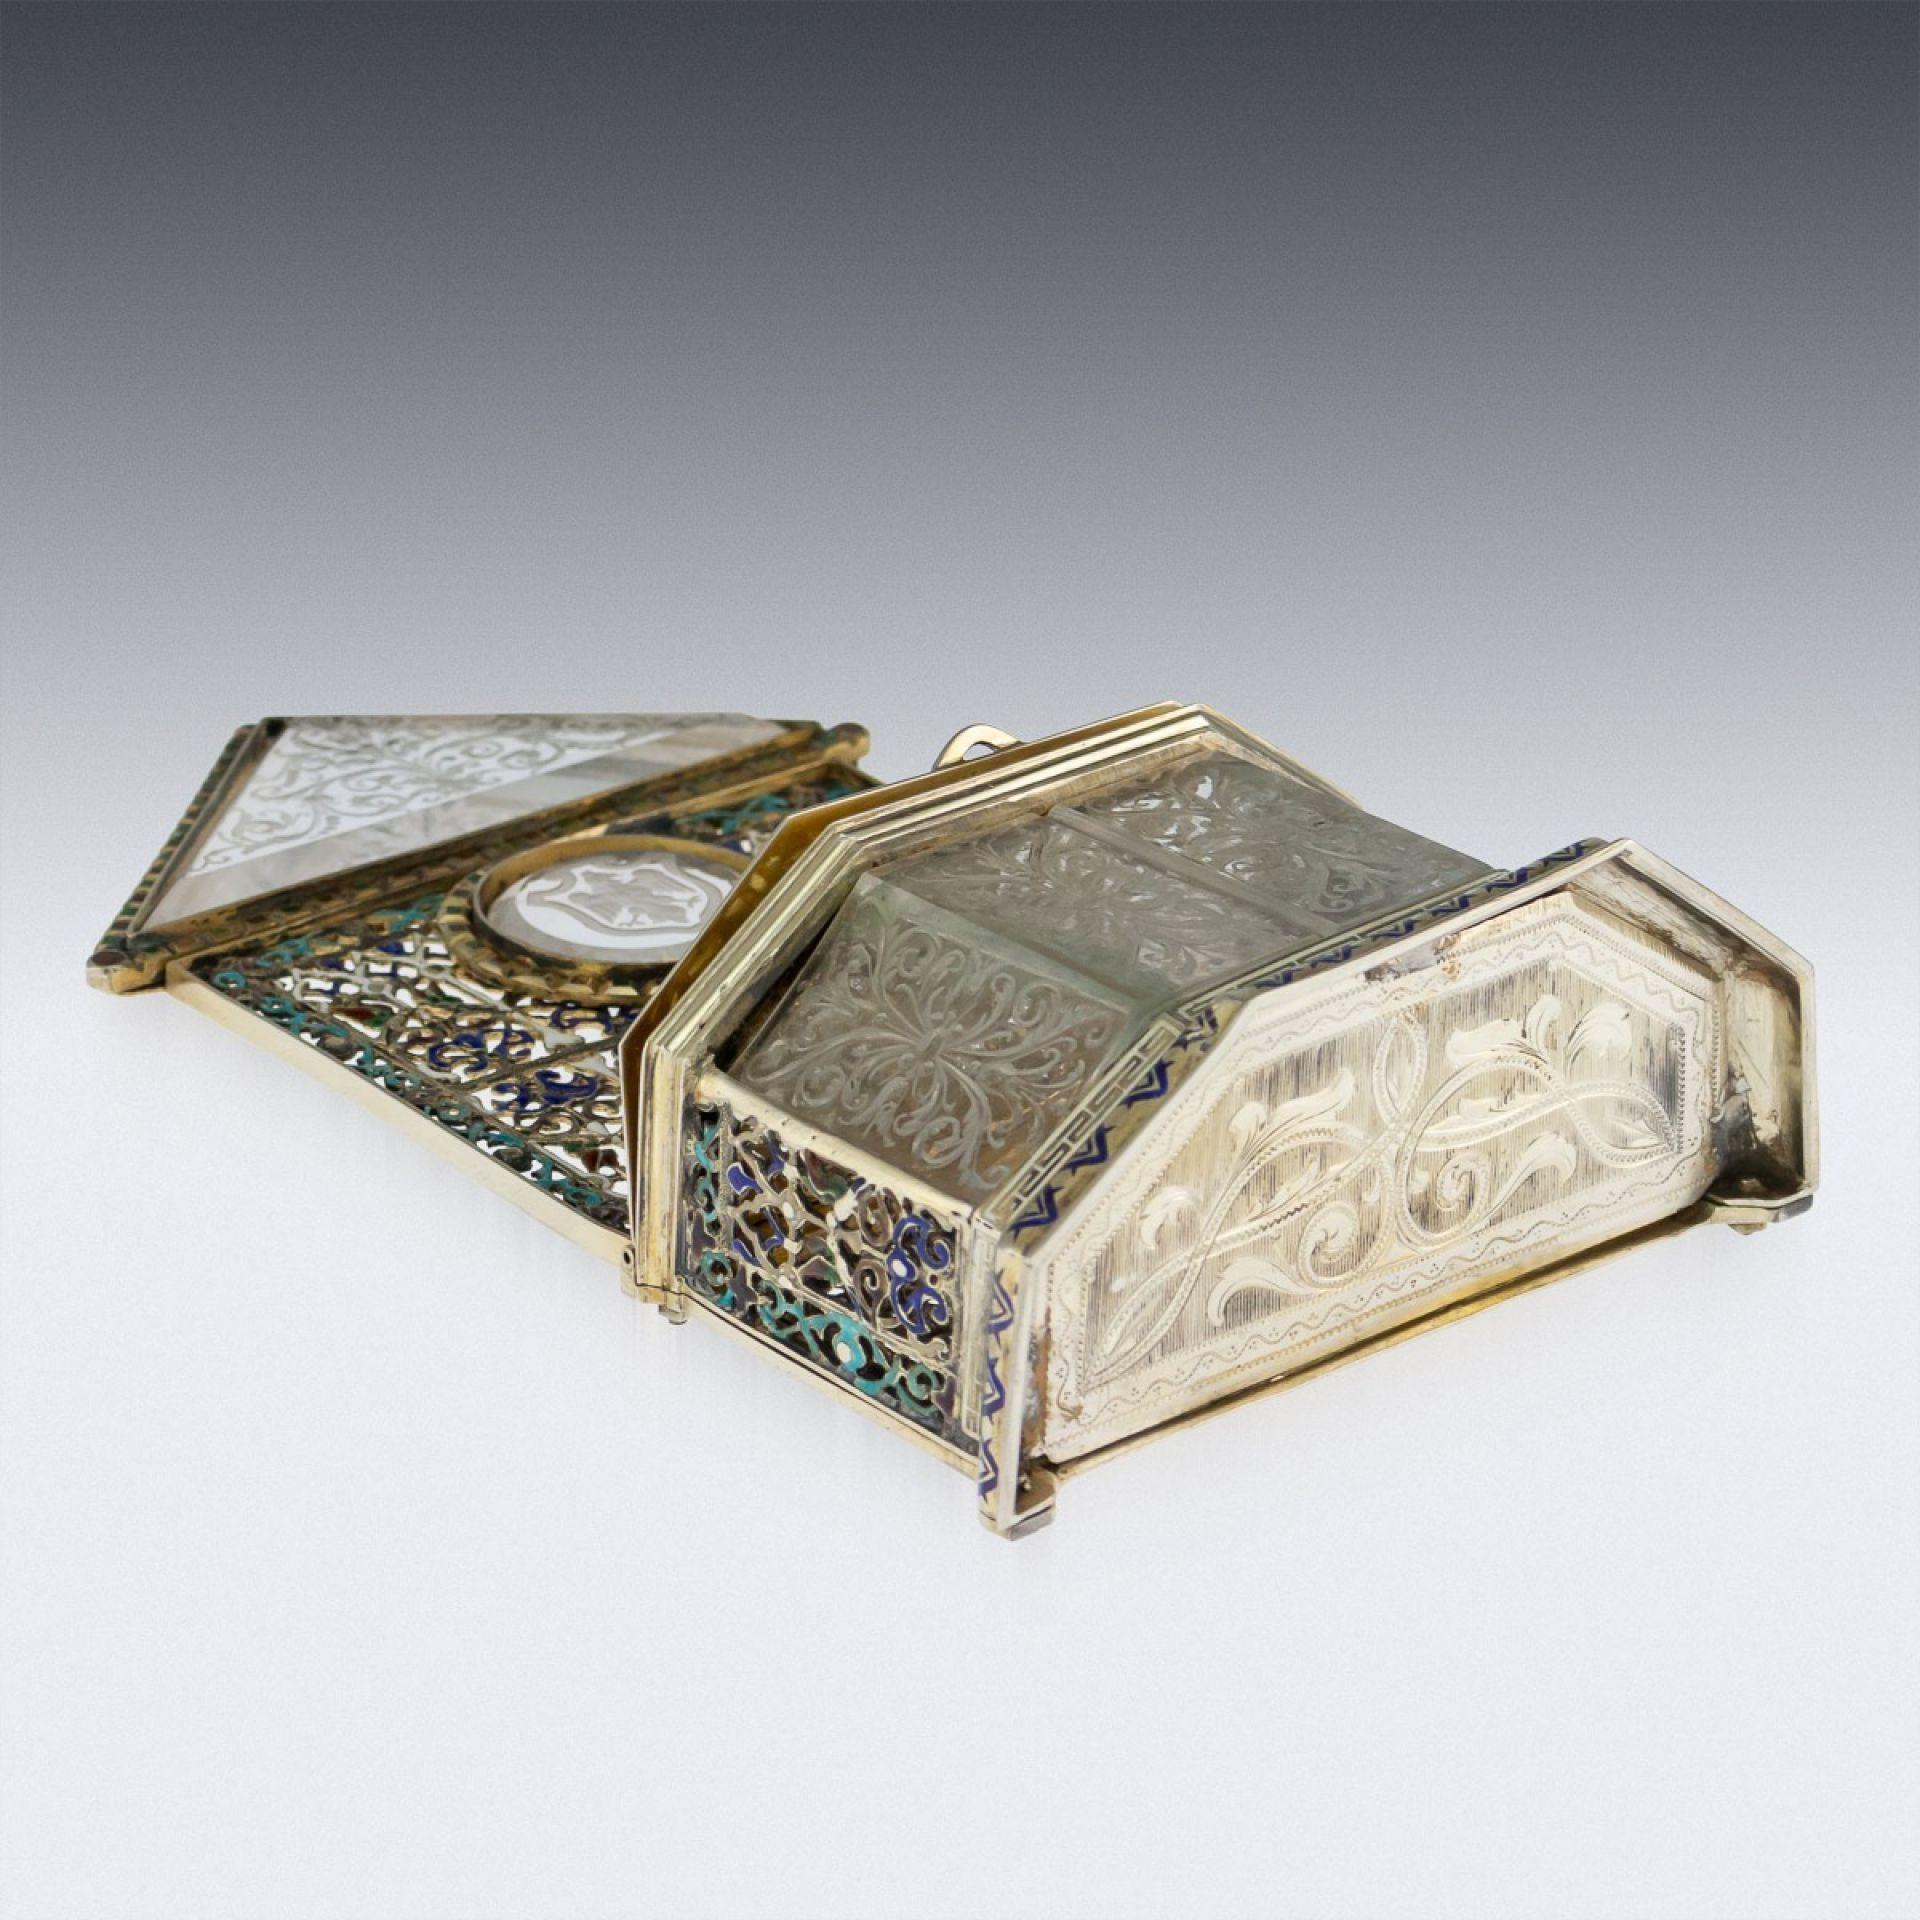 ANTIQUE 19thC AUSTRIAN SOLID SILVER-GILT & ENAMEL RELIQUARY, RUDOLF LINKE c.1890